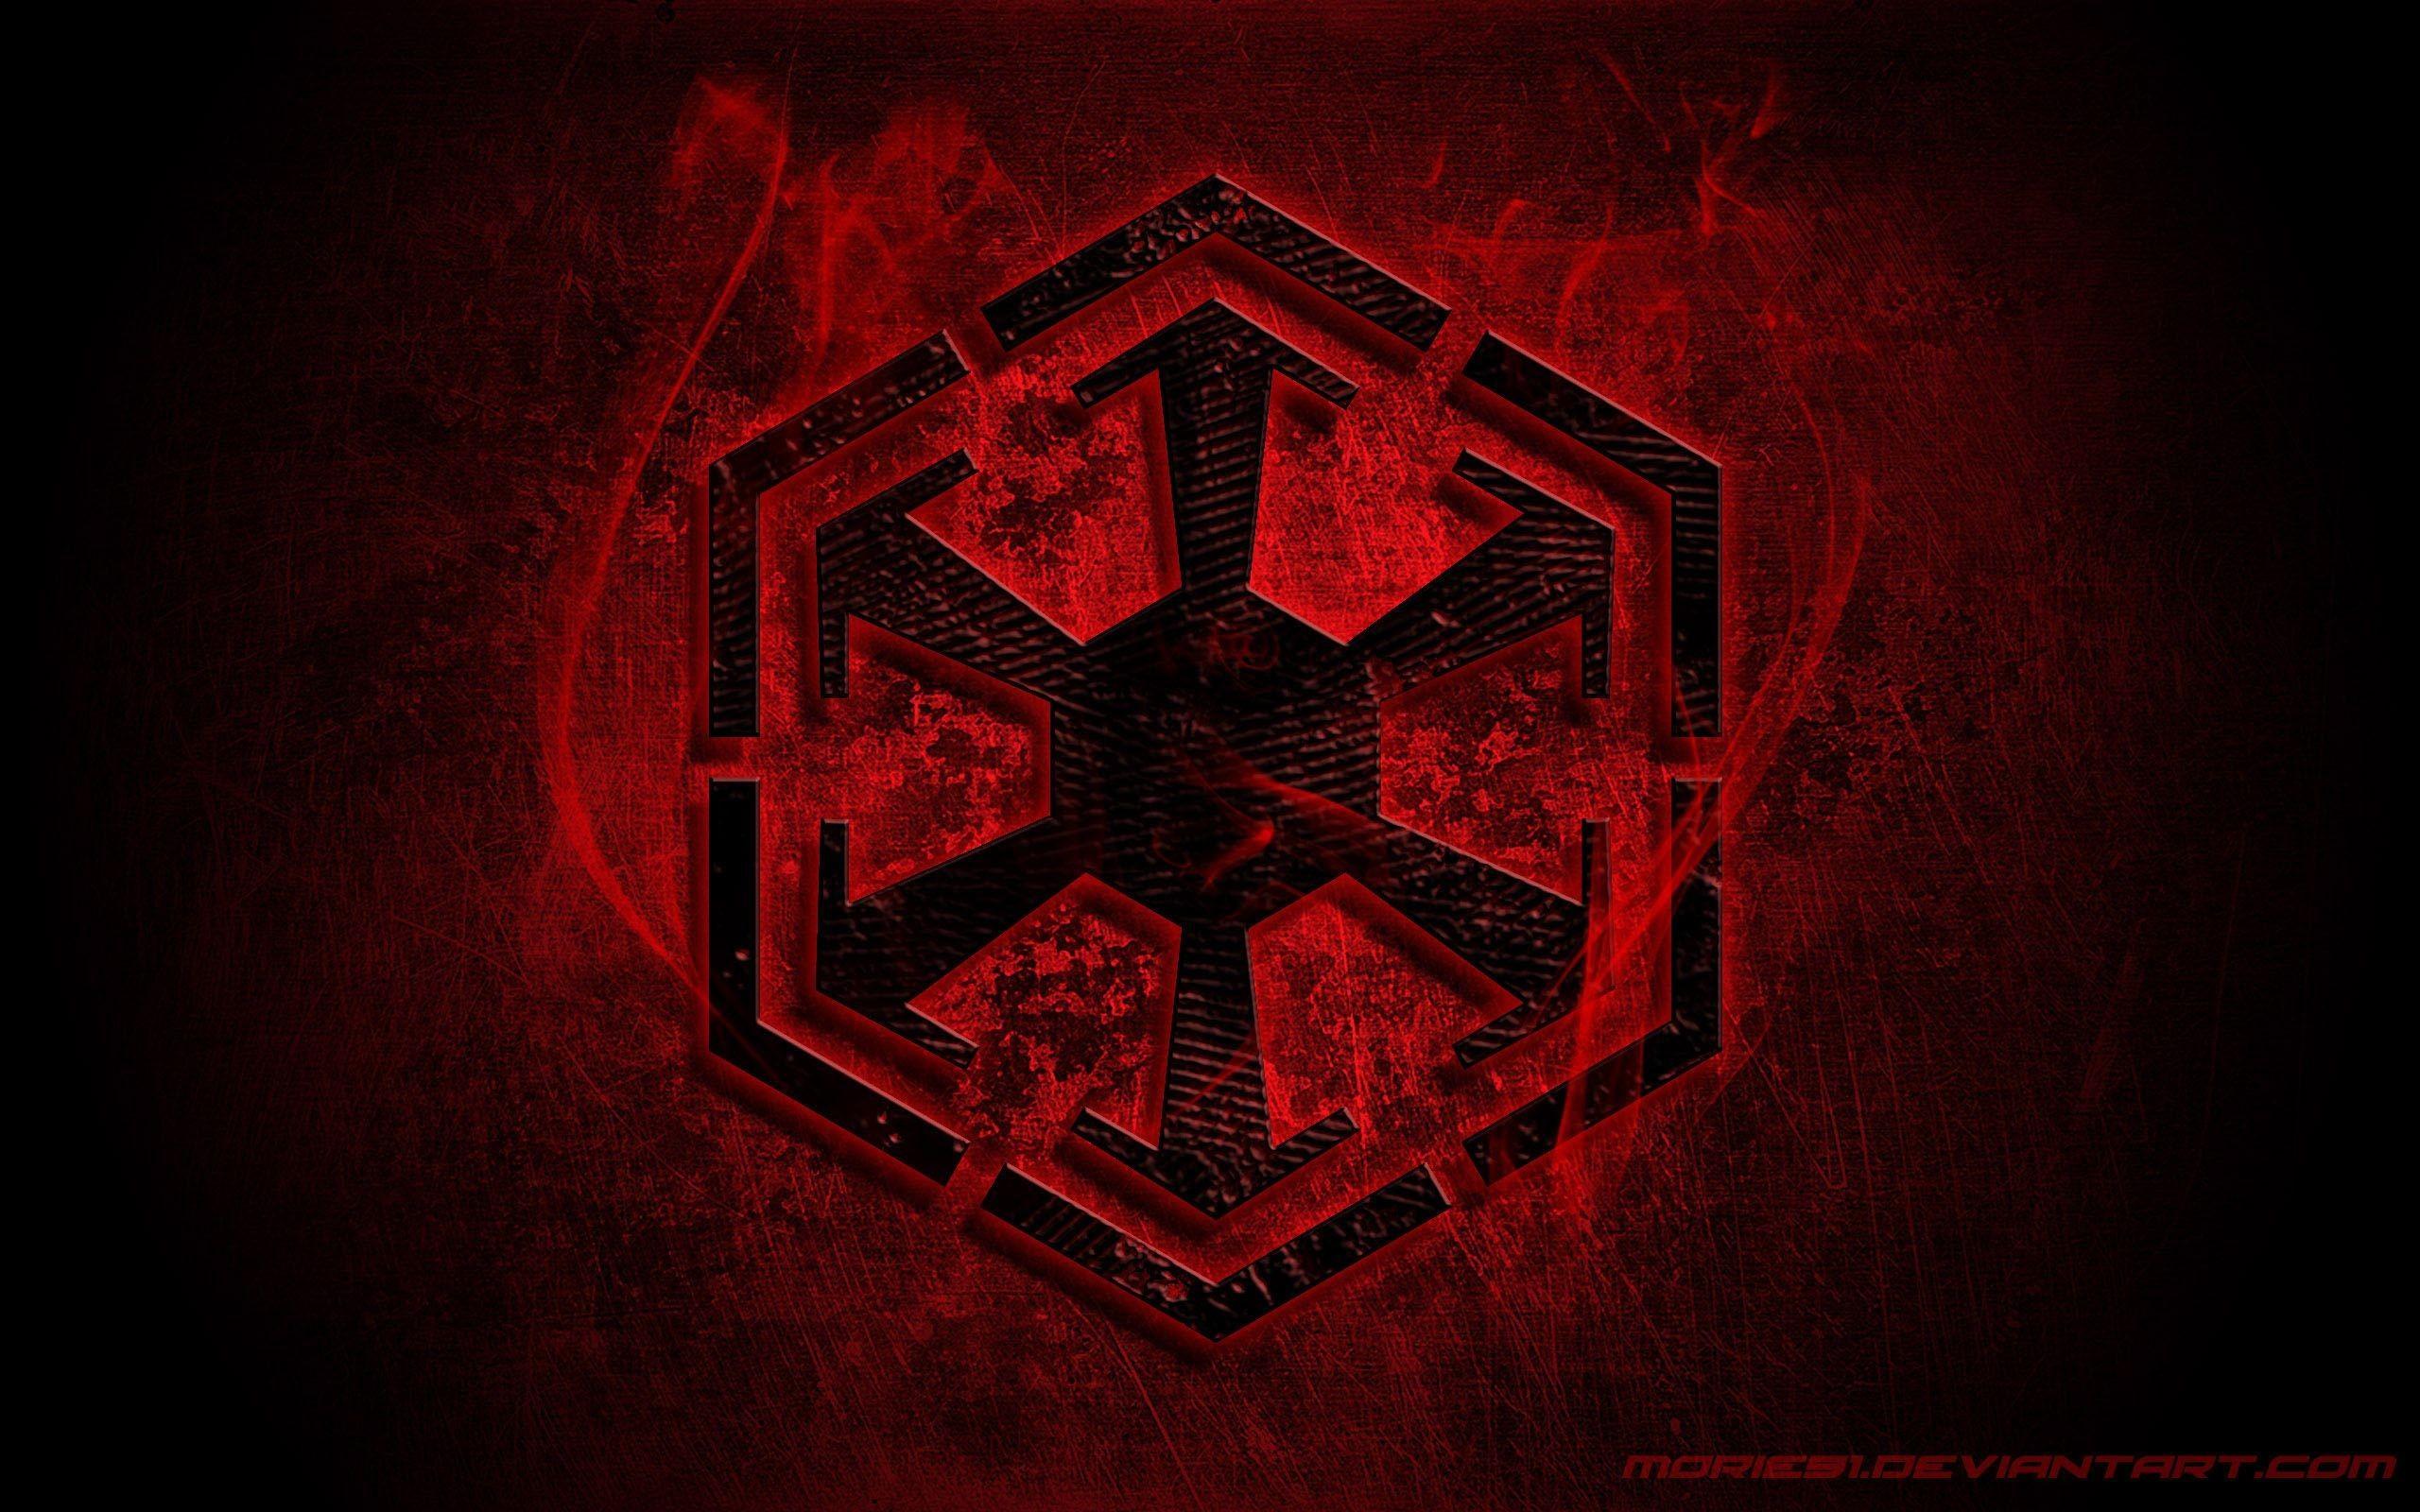 Star Wars Jedi Symbol Wallpaper Posted By John Tremblay